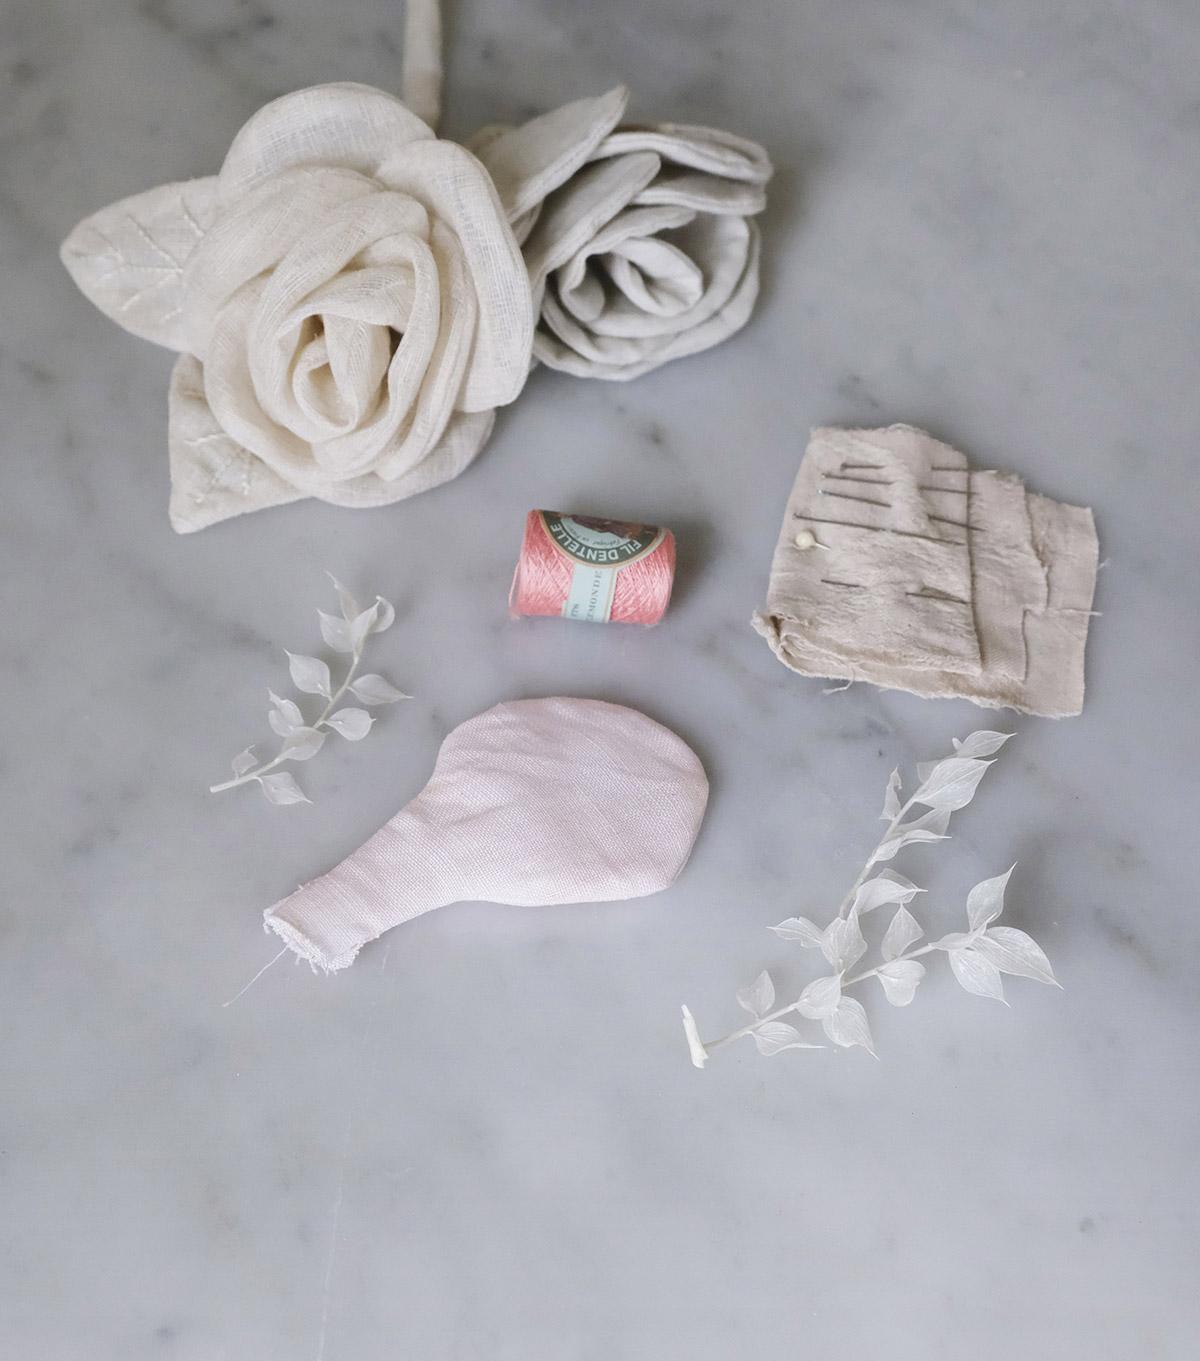 Tutorial Blanc MariClo' - Sbocciano le rose - step 3 parte 2